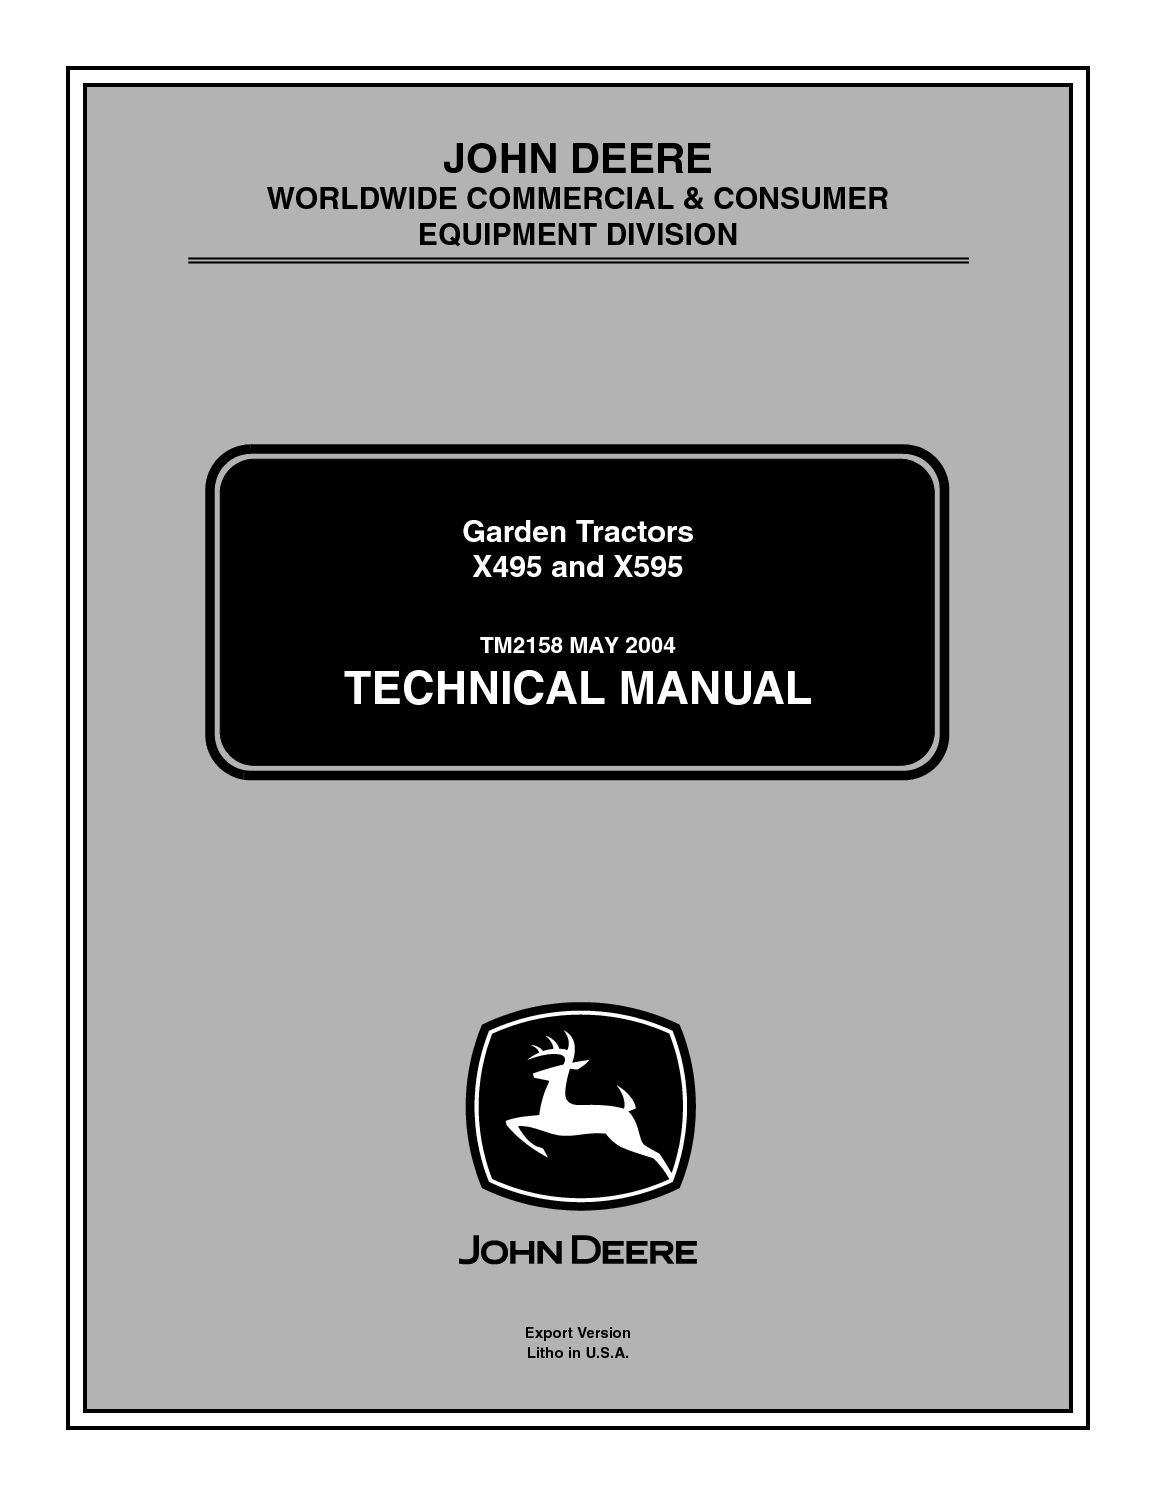 calam o john deere x595 lawn garden tractor service repair manual rh calameo com